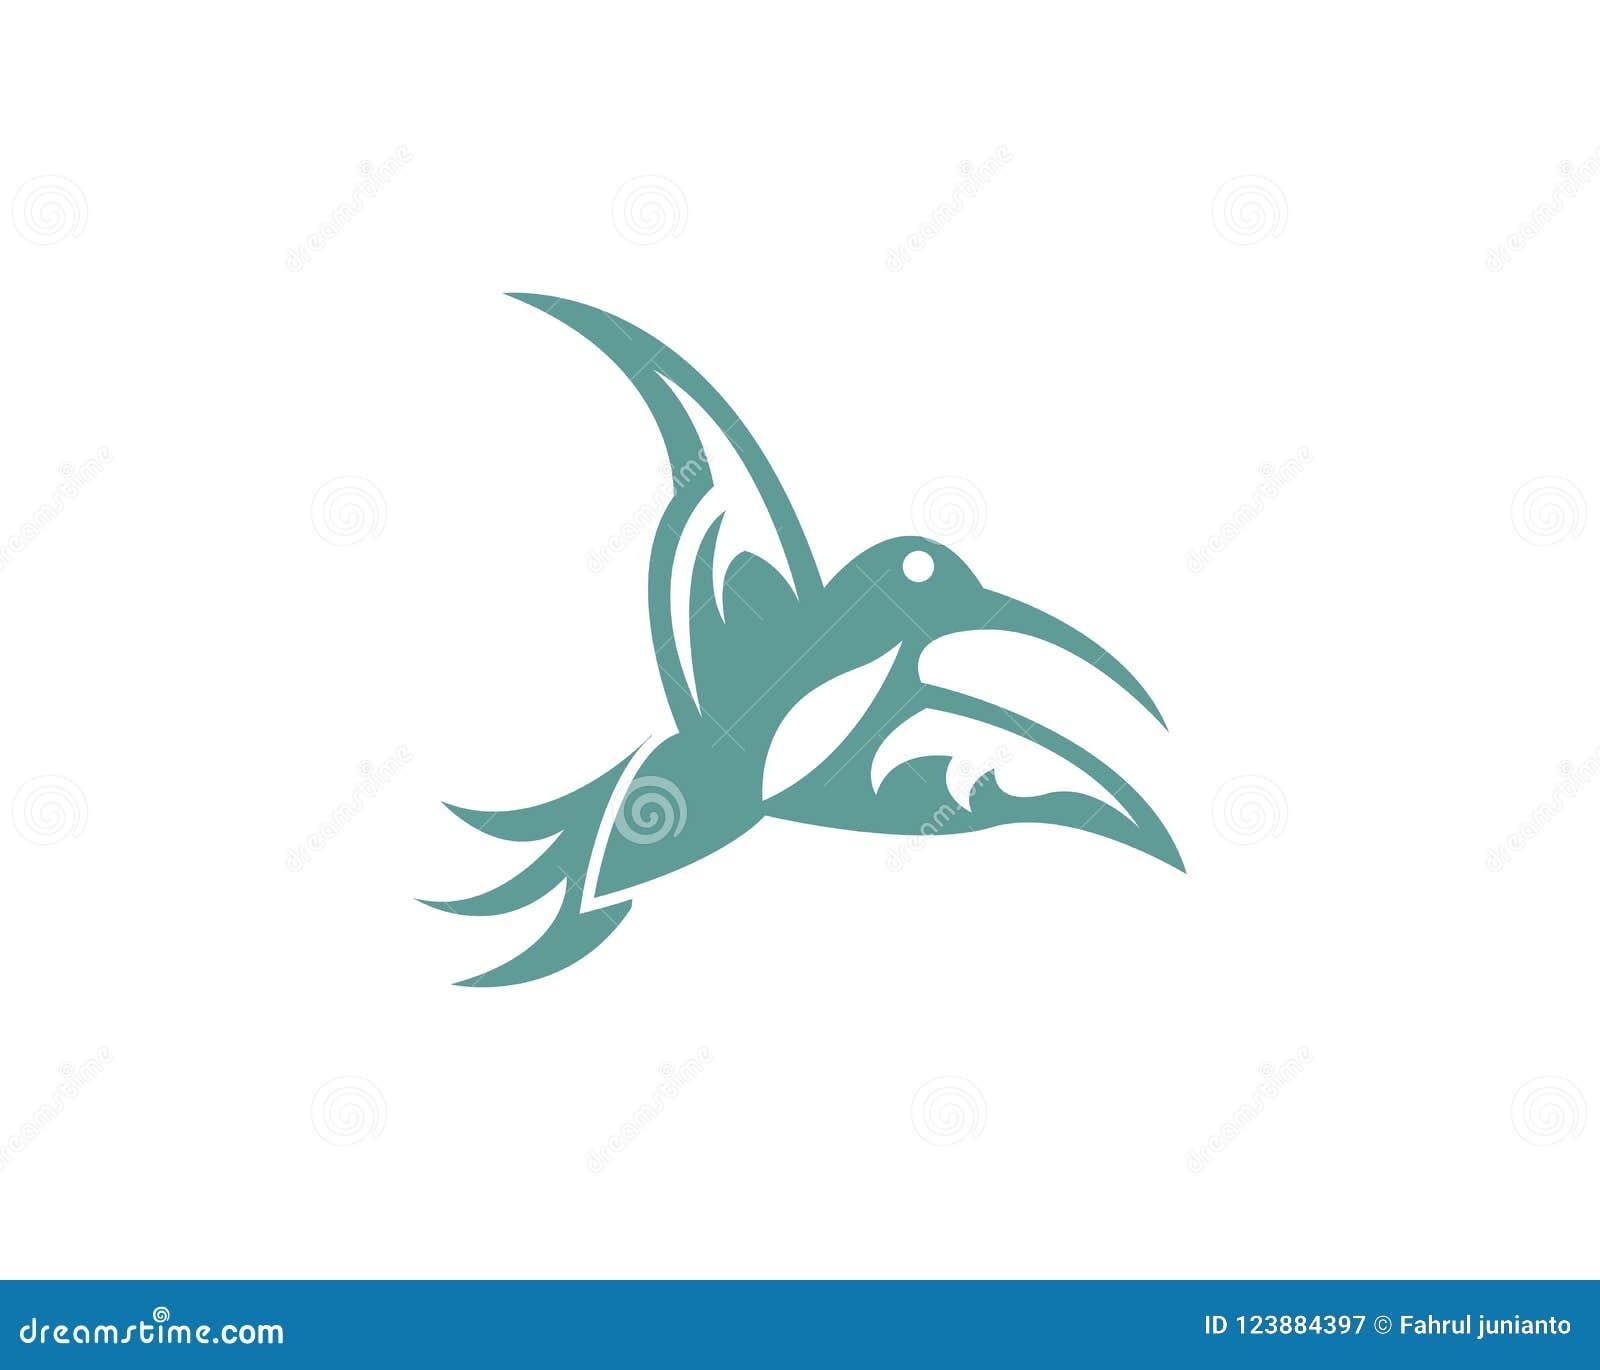 humming bird logo template stock vector illustration of travel